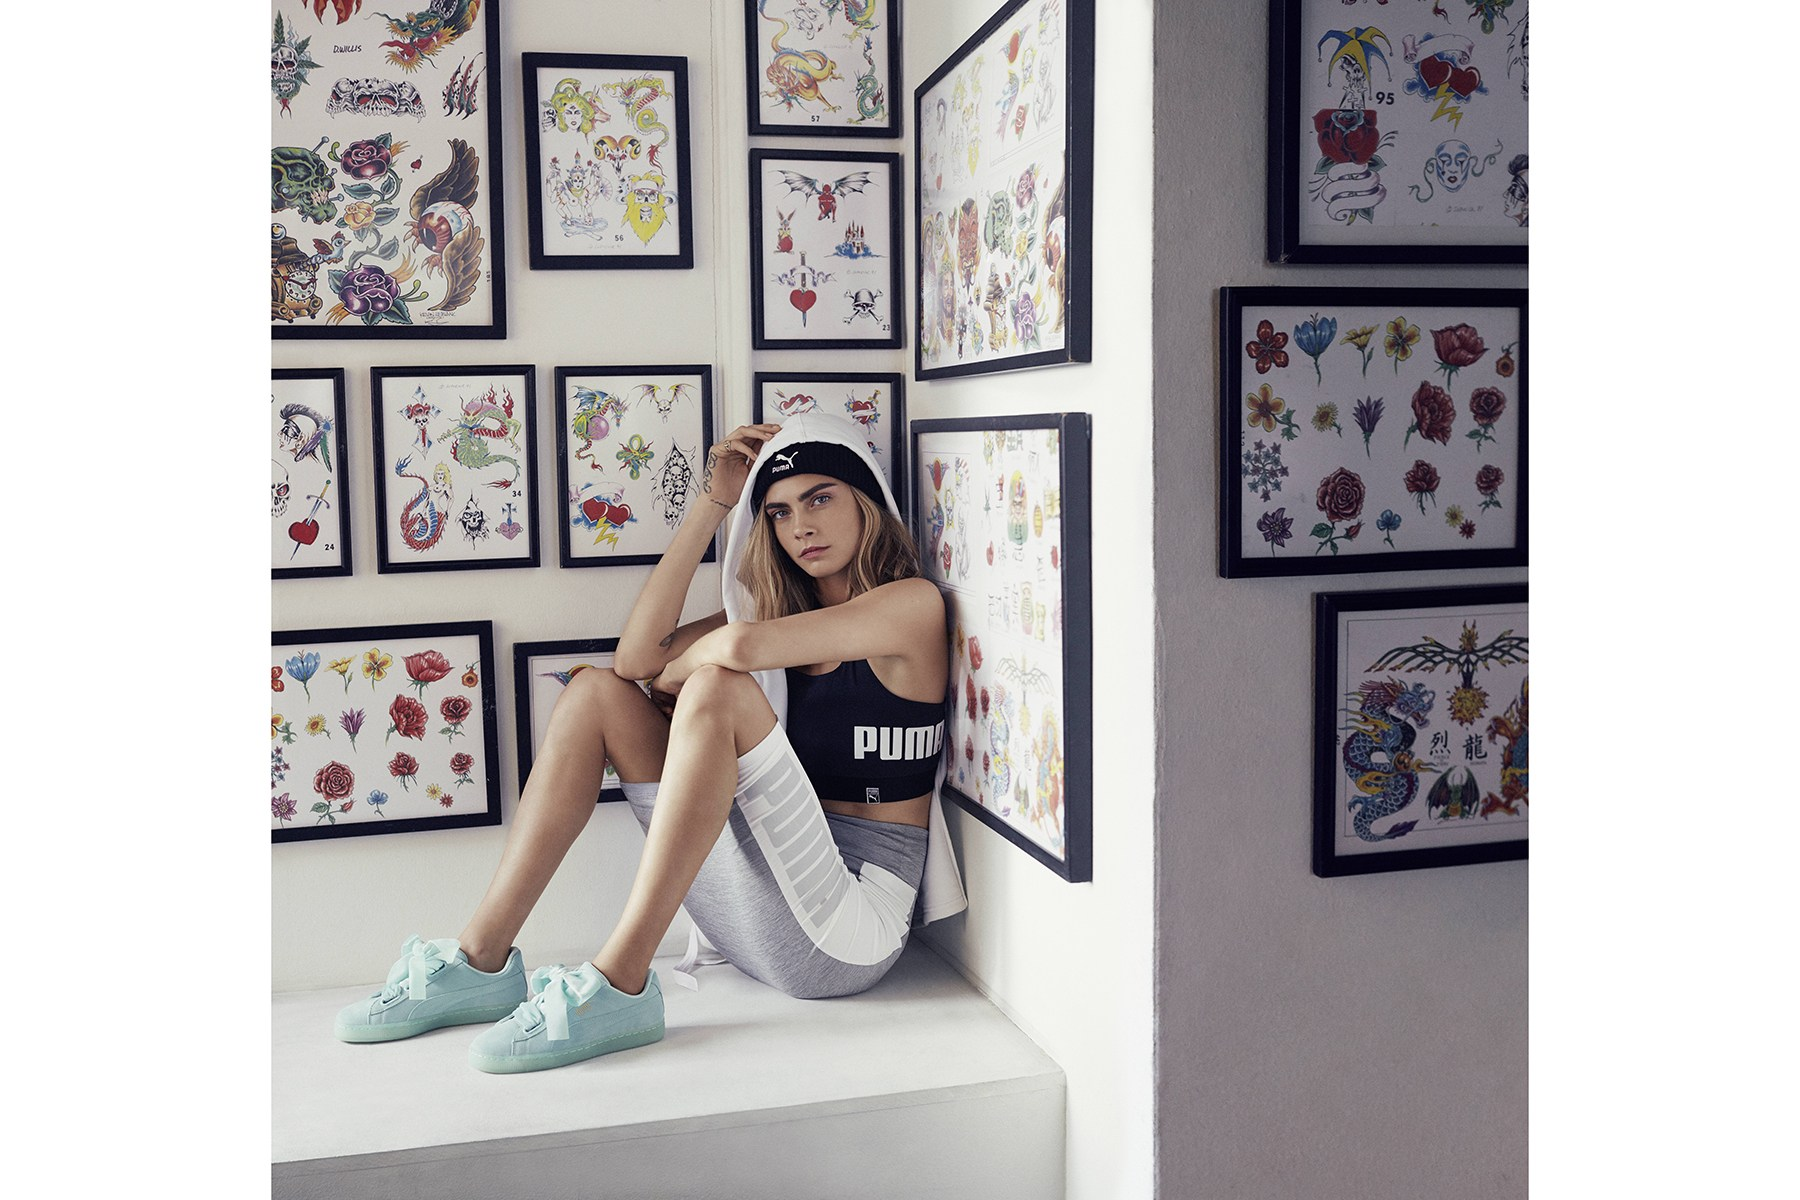 cara-delevingne-puma-2017-spring-summer-campaign-2